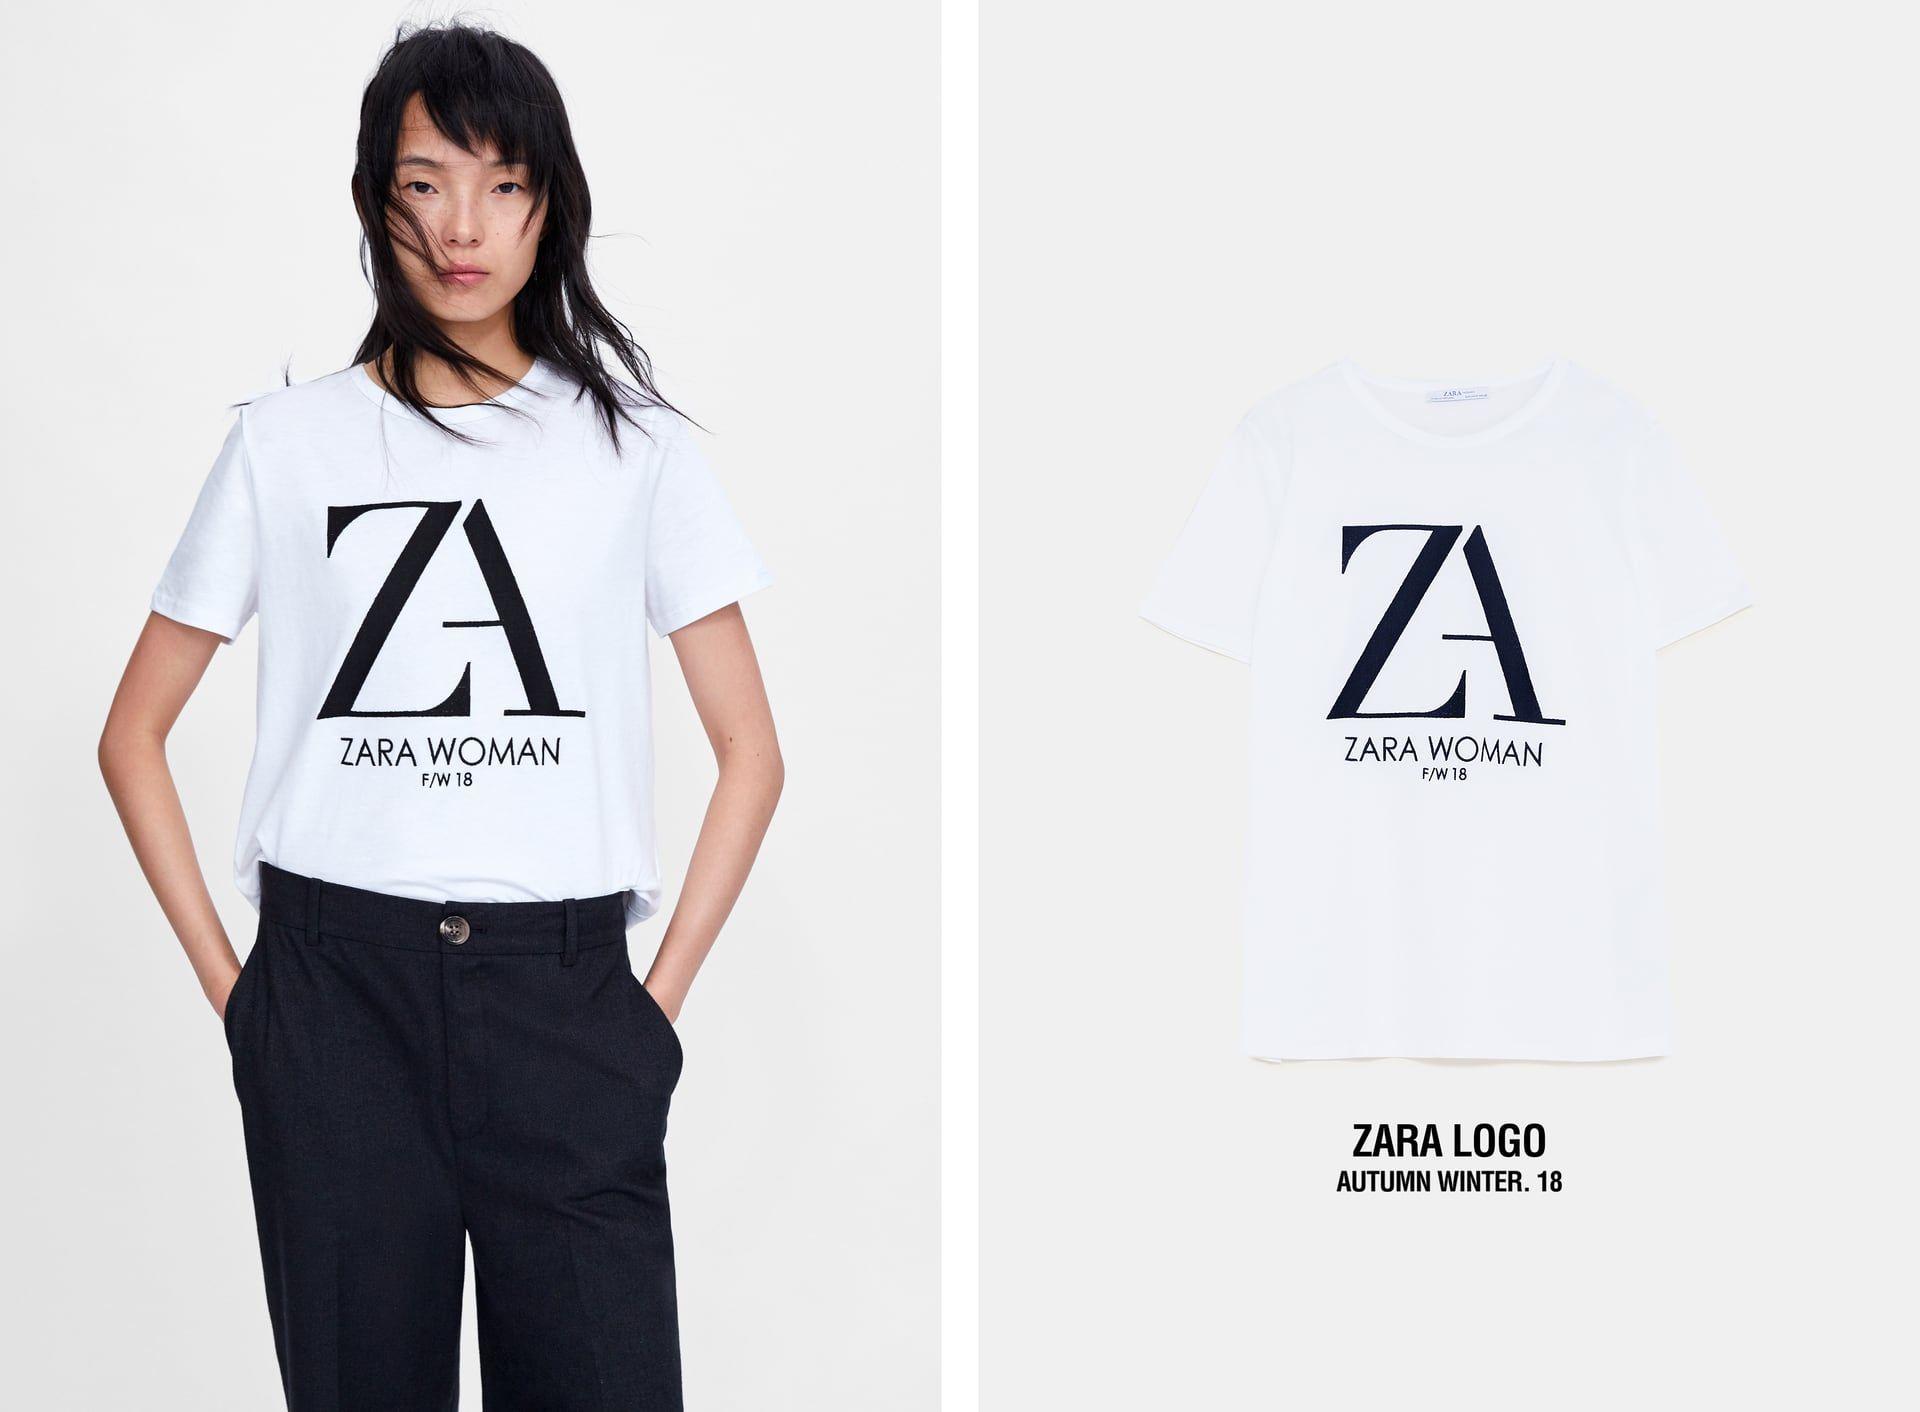 78108774ee ZARA LOGO T-SHIRT | « A T T I R E » in 2019 | Zara logo, Zara ...